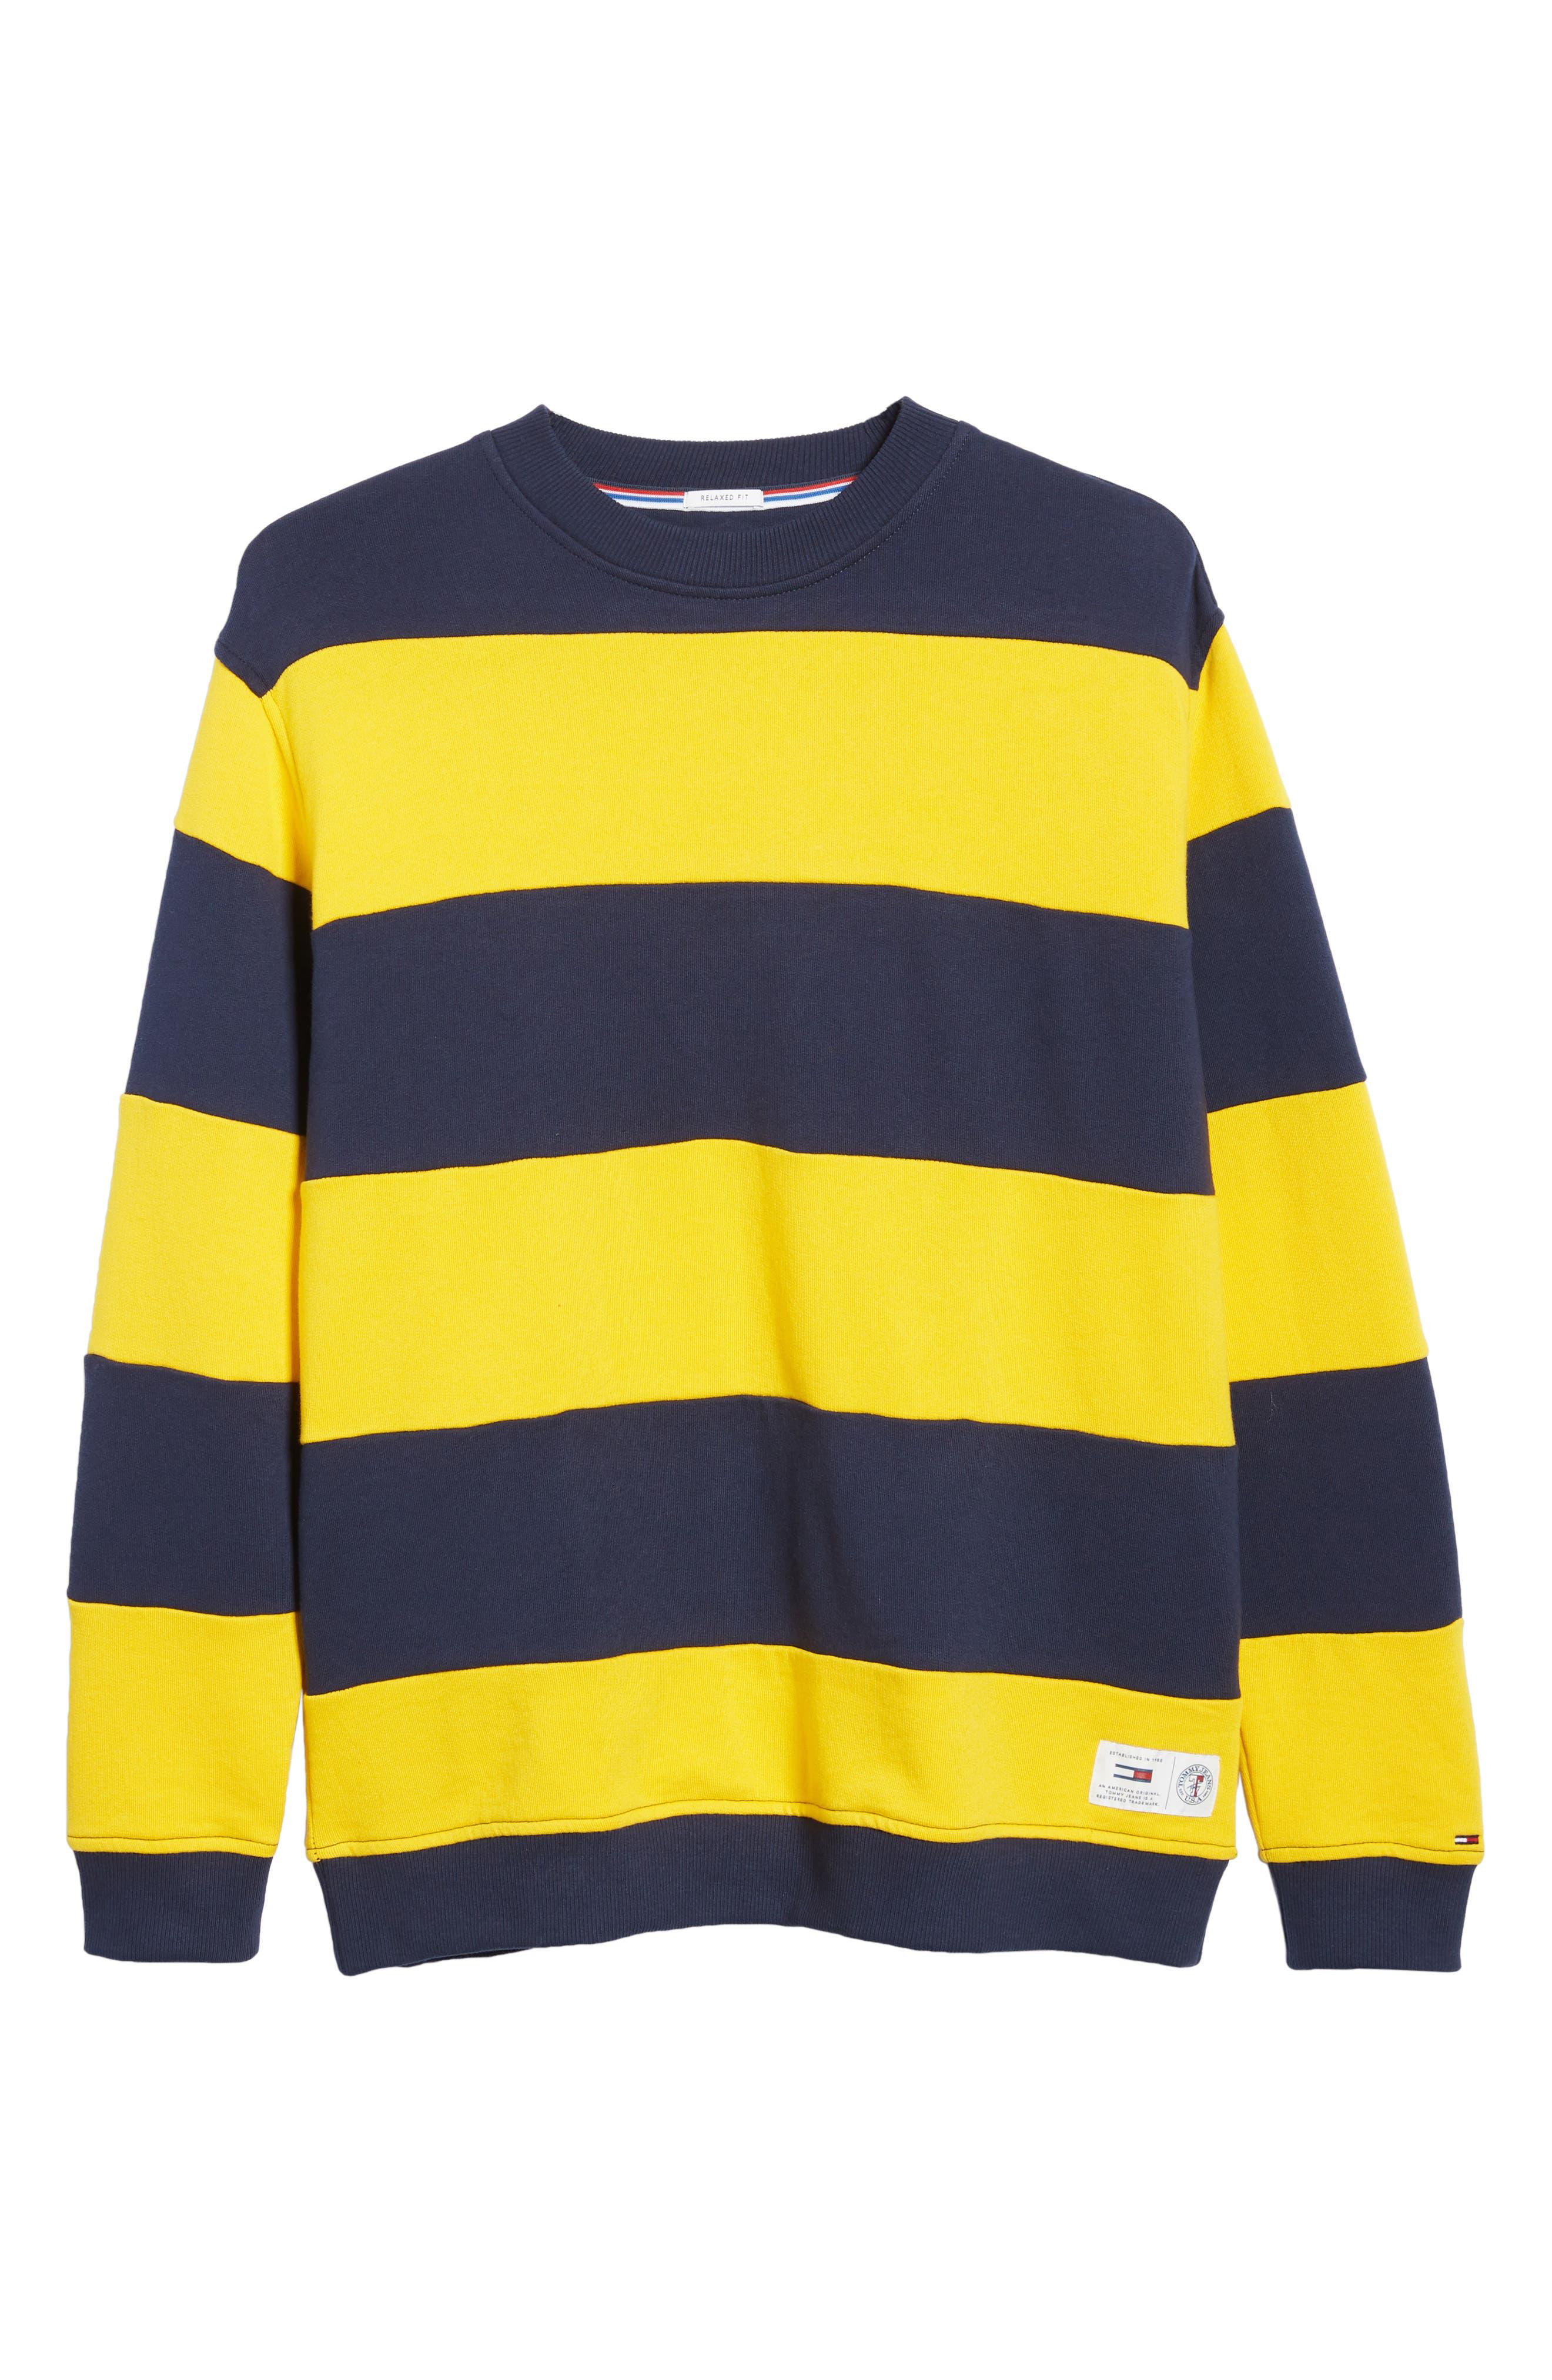 TJM Big Stripe Crew Shirt,                             Alternate thumbnail 6, color,                             BLACK IRIS / SPECTRA YELLOW